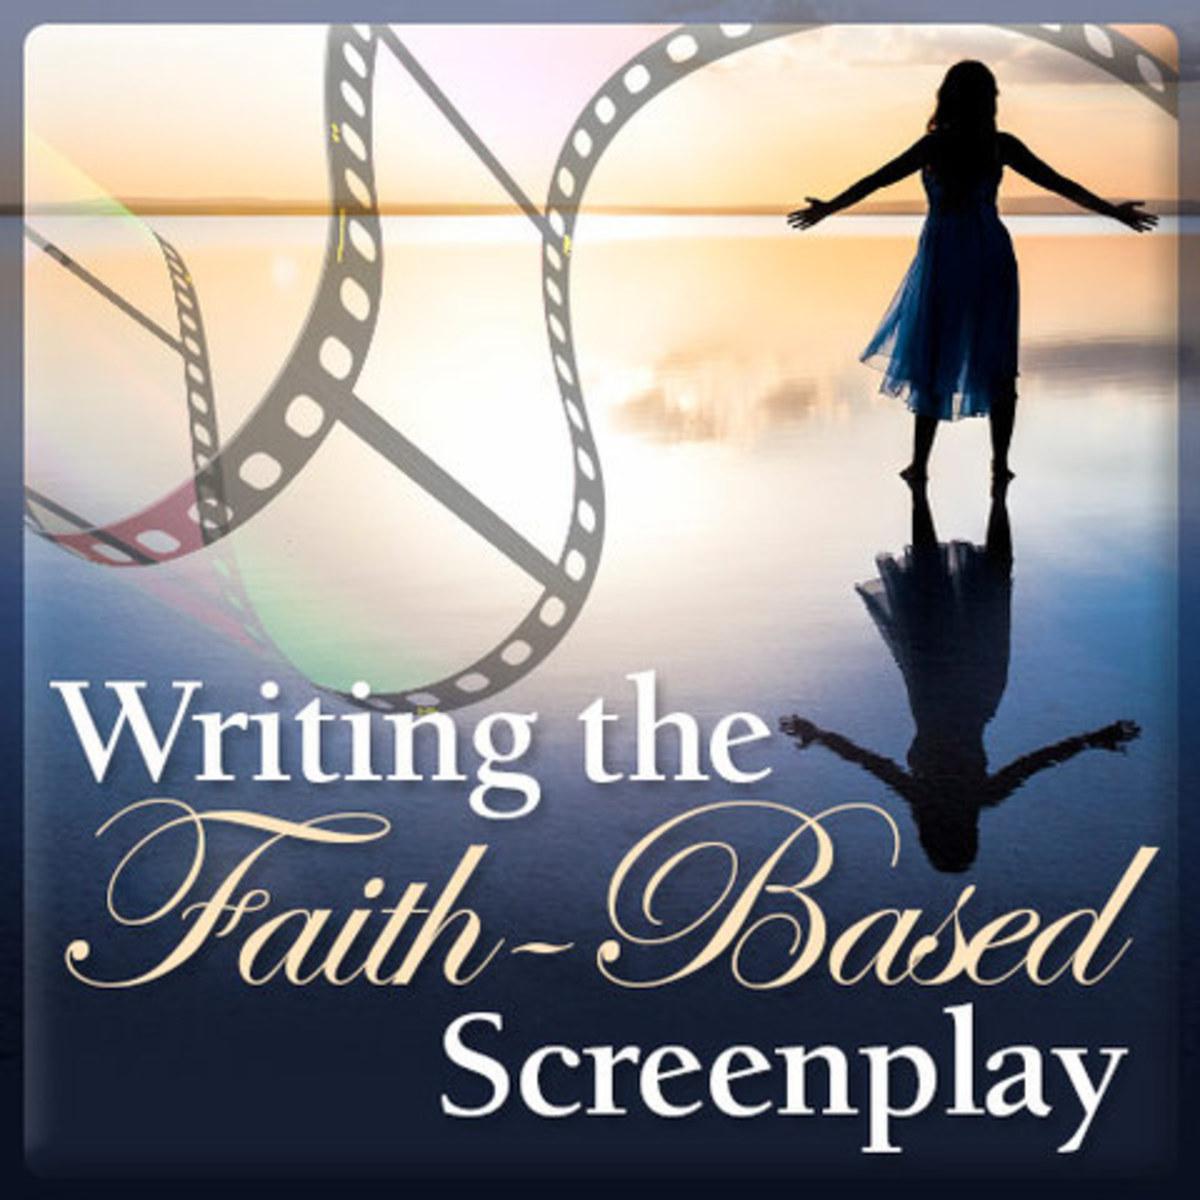 ws_faithbasedscreenplay-500_medium